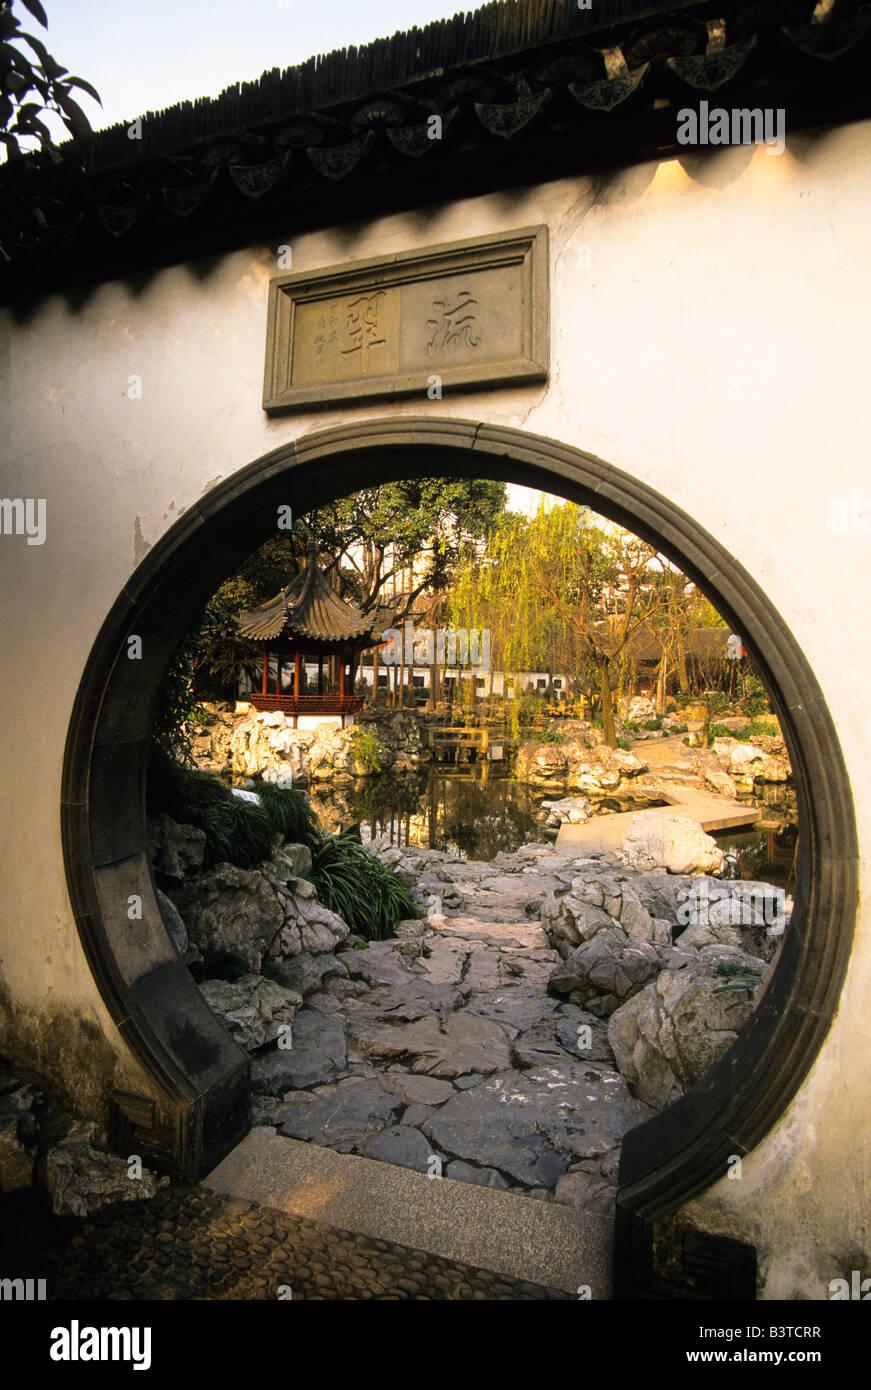 Decorating circular door images View of Yuyuan Gardens through the circular door in a traditional ...